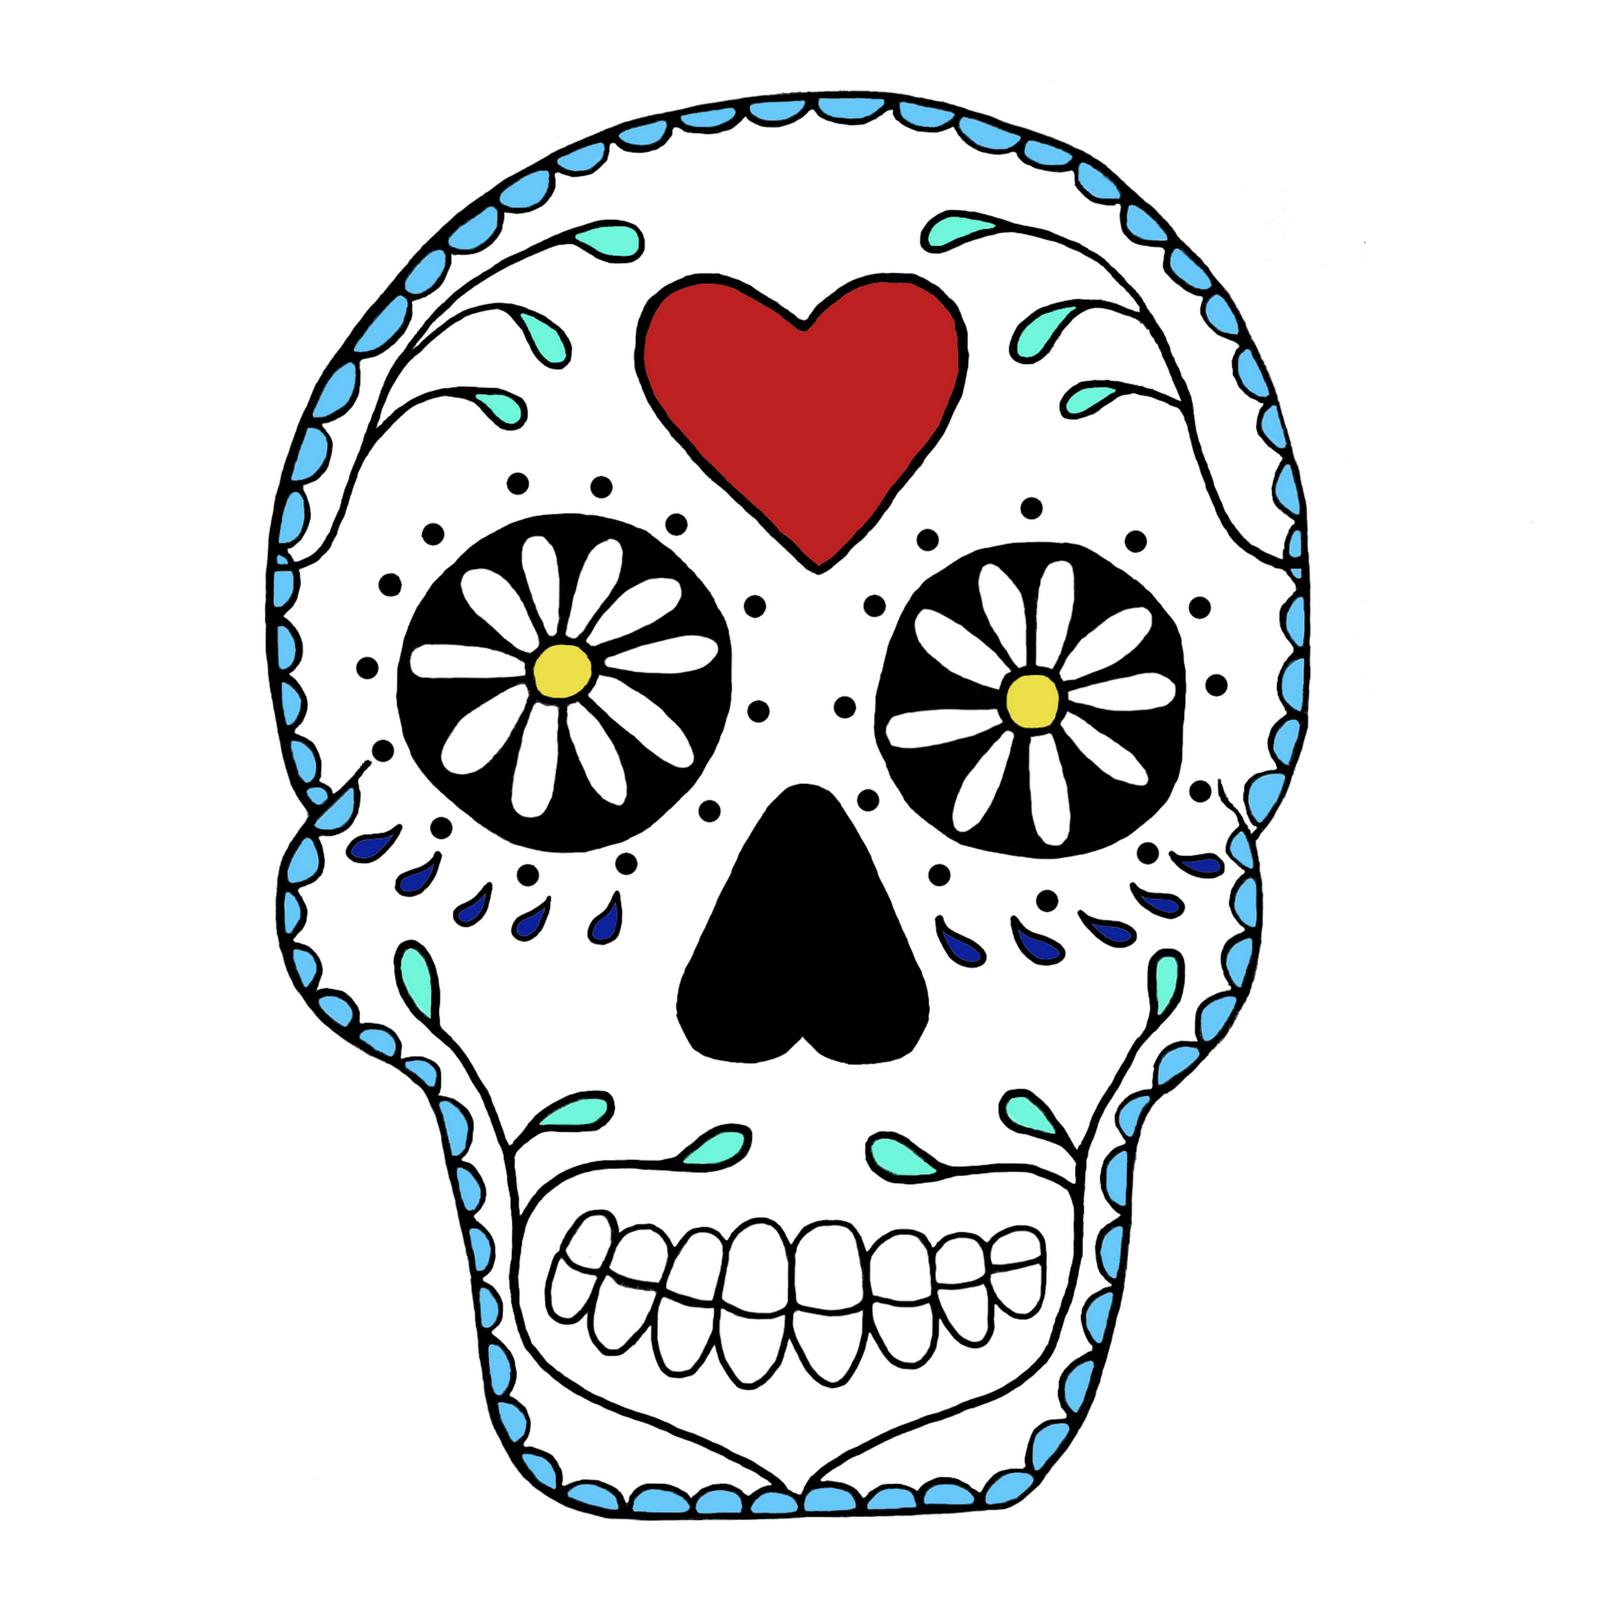 sugar skull clipart at getdrawings com free for personal use sugar rh getdrawings com clipart skull clip art skull and bones